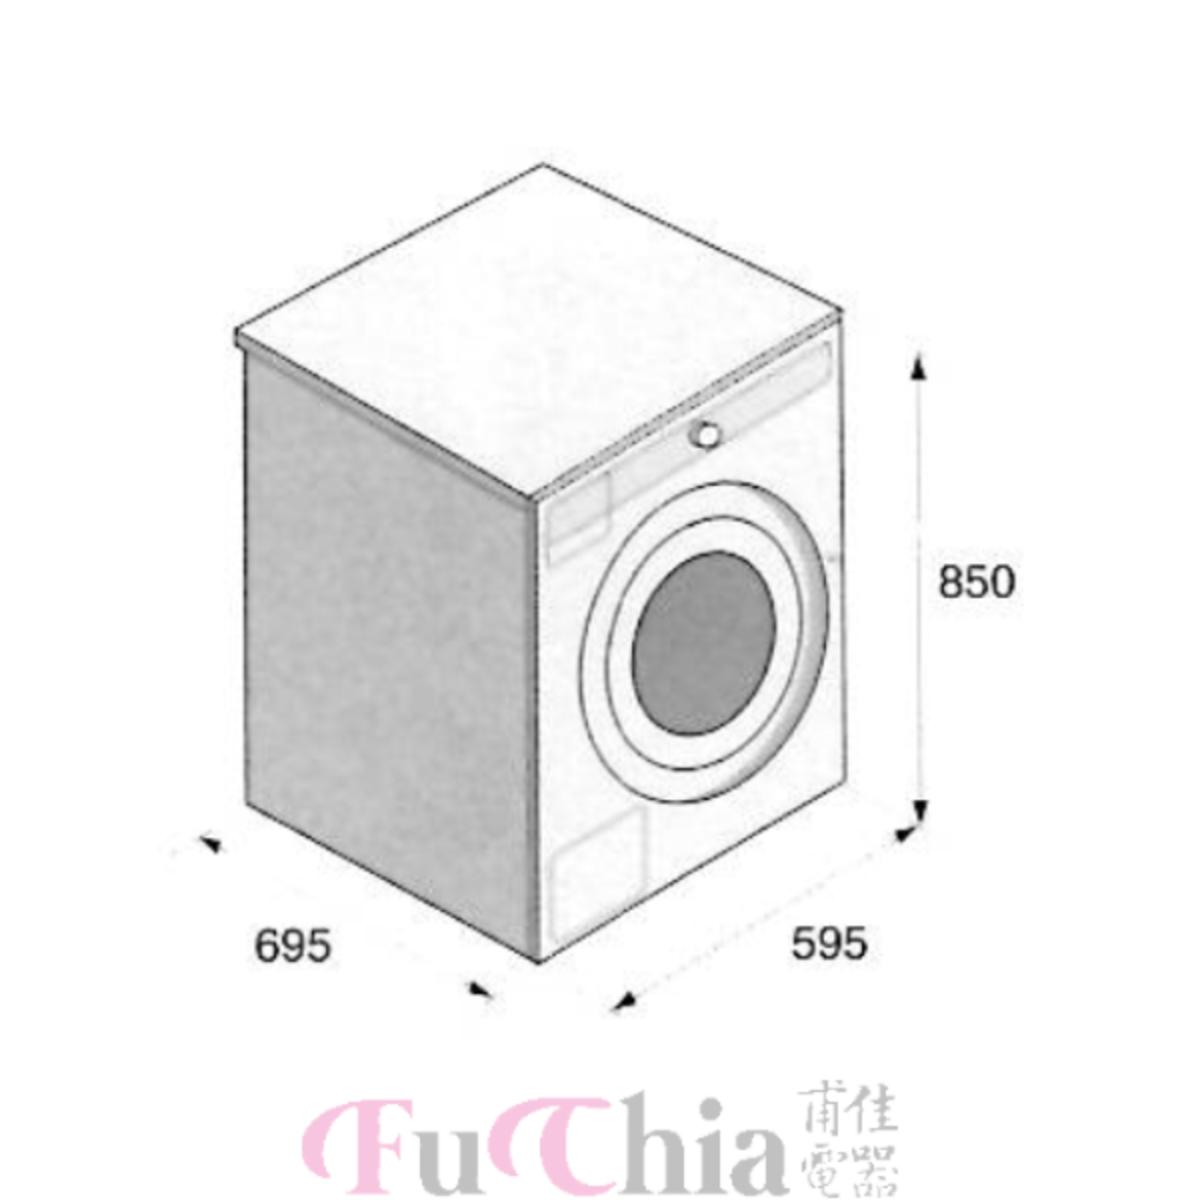 ASKO W4114C.W.TW 滾筒洗衣機 11公斤(歐規)  220V/110V